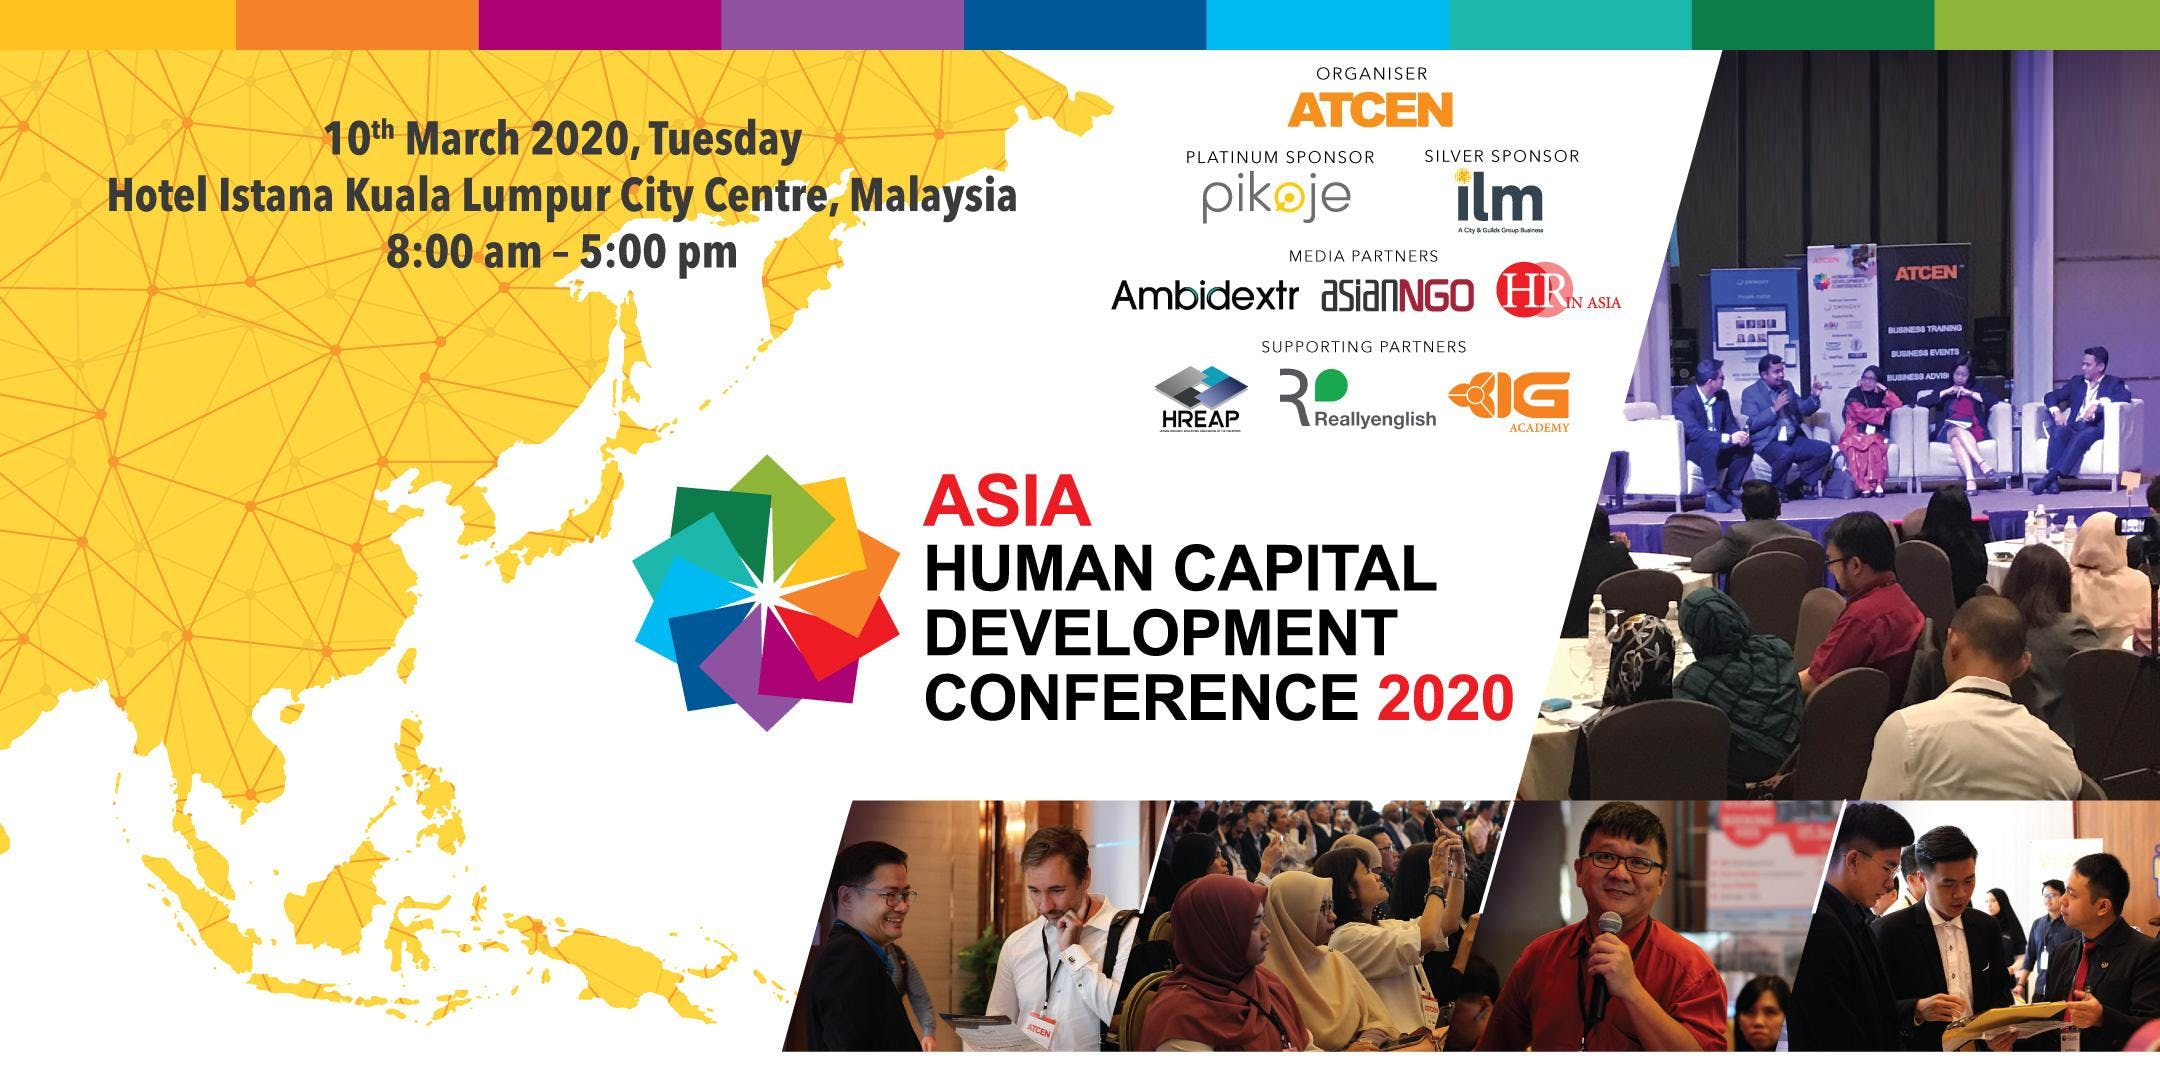 Asia Human Capital Development Conference 2020